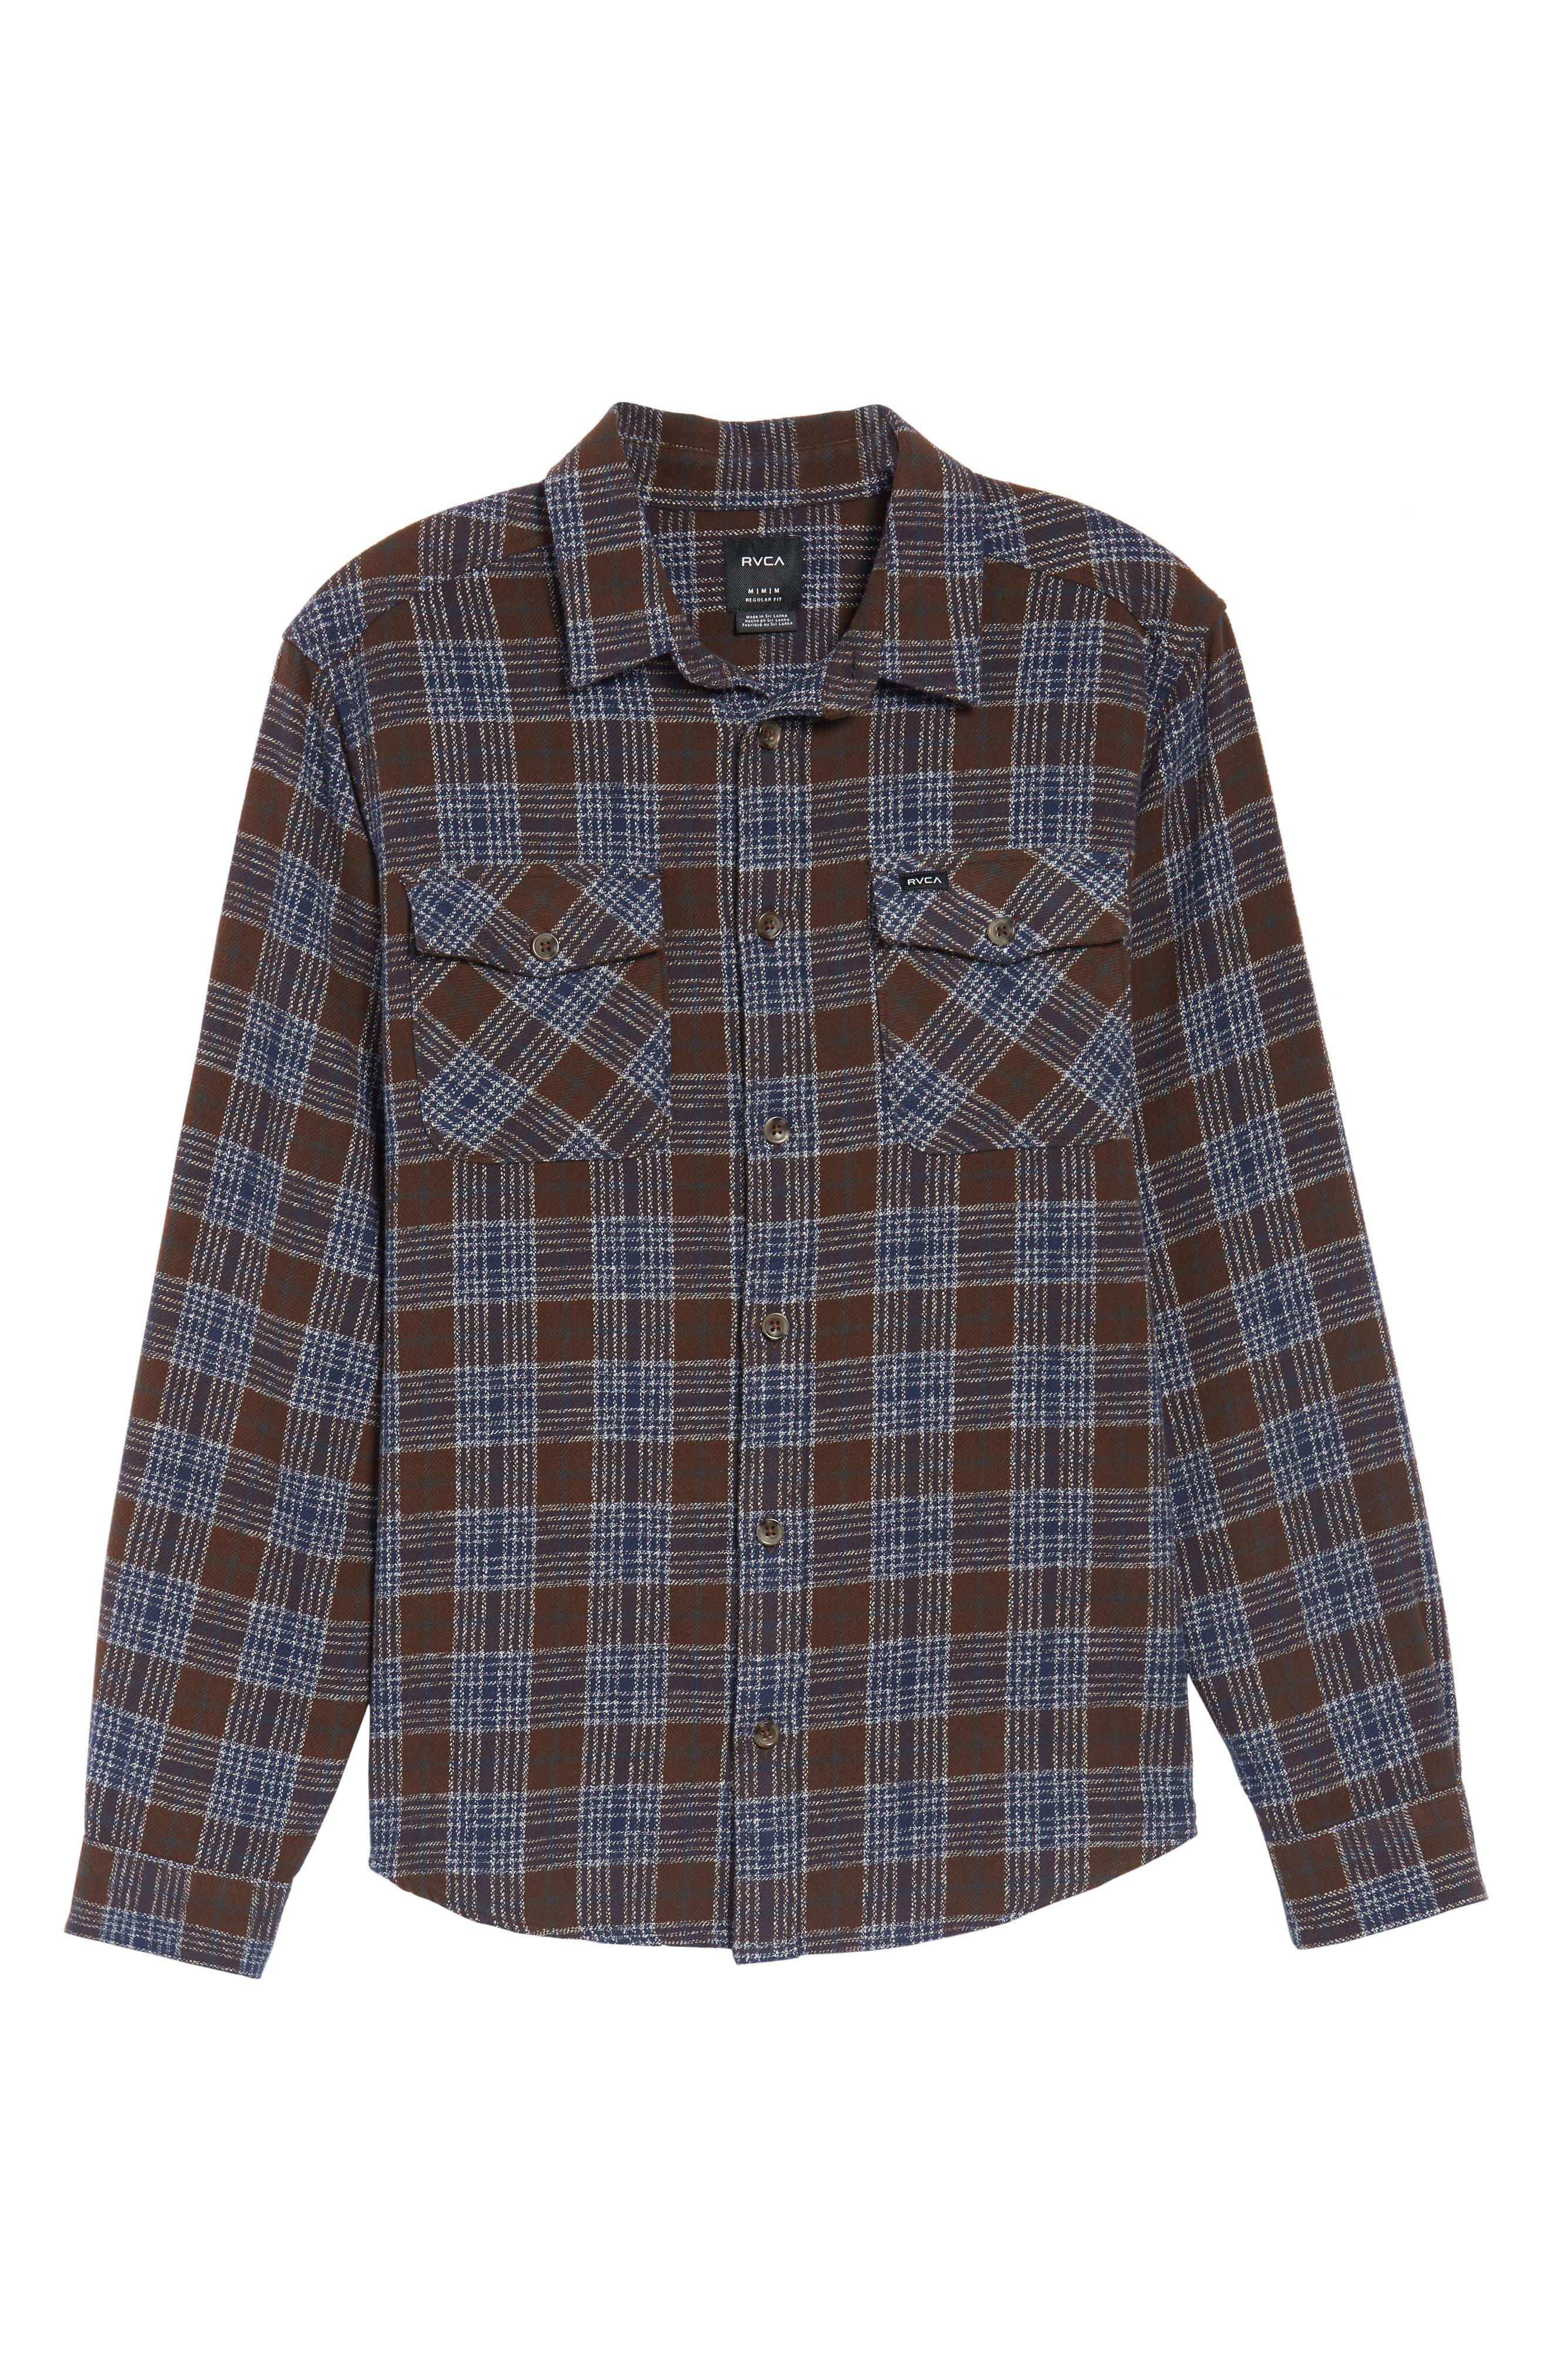 'That'll Work' Trim Fit Plaid Flannel Shirt,                             Alternate thumbnail 32, color,